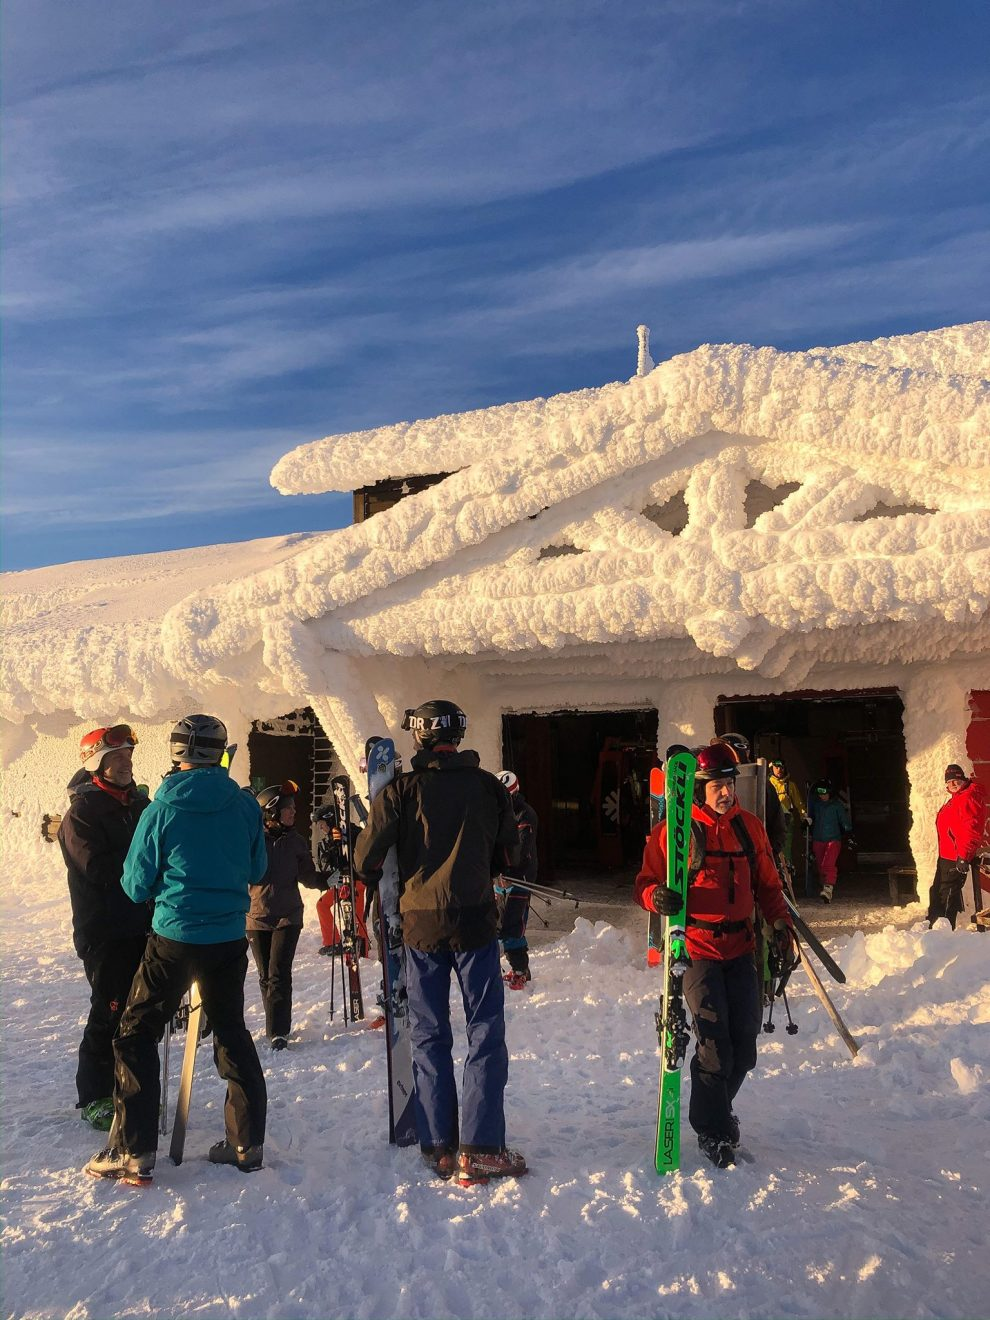 Skistar Åre topp platå - Wintersport Åre Zweden - beste skigebied van Zweden